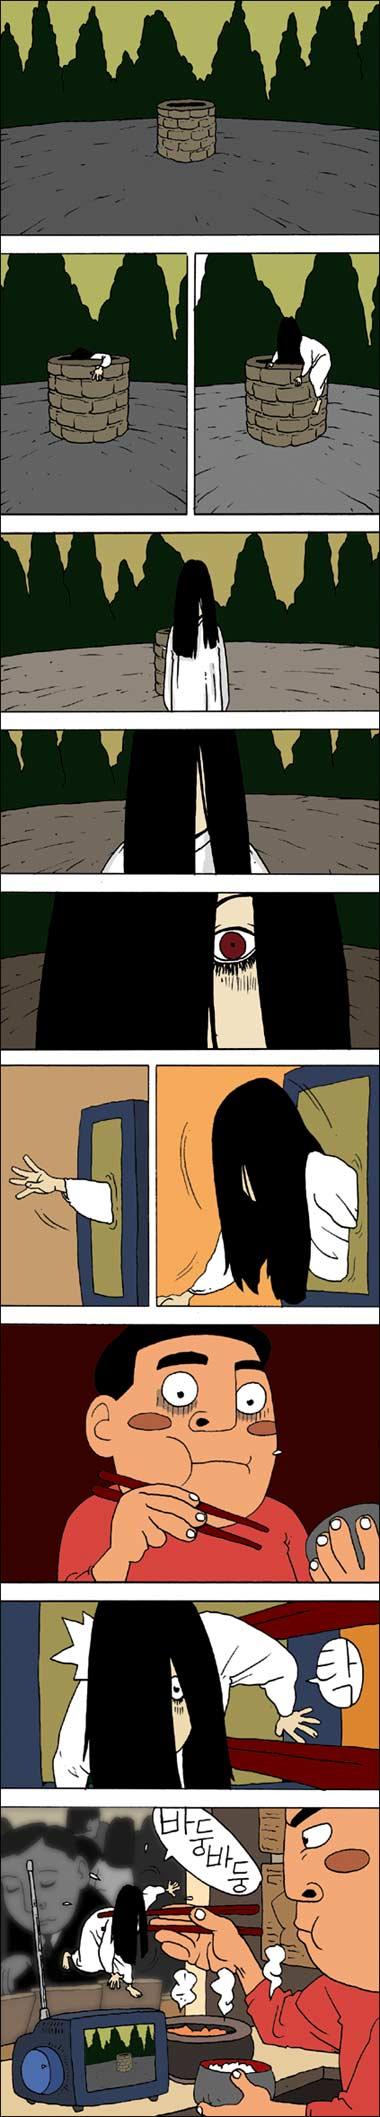 The Ring. Korean Comics.. Reminded me of this korean comics